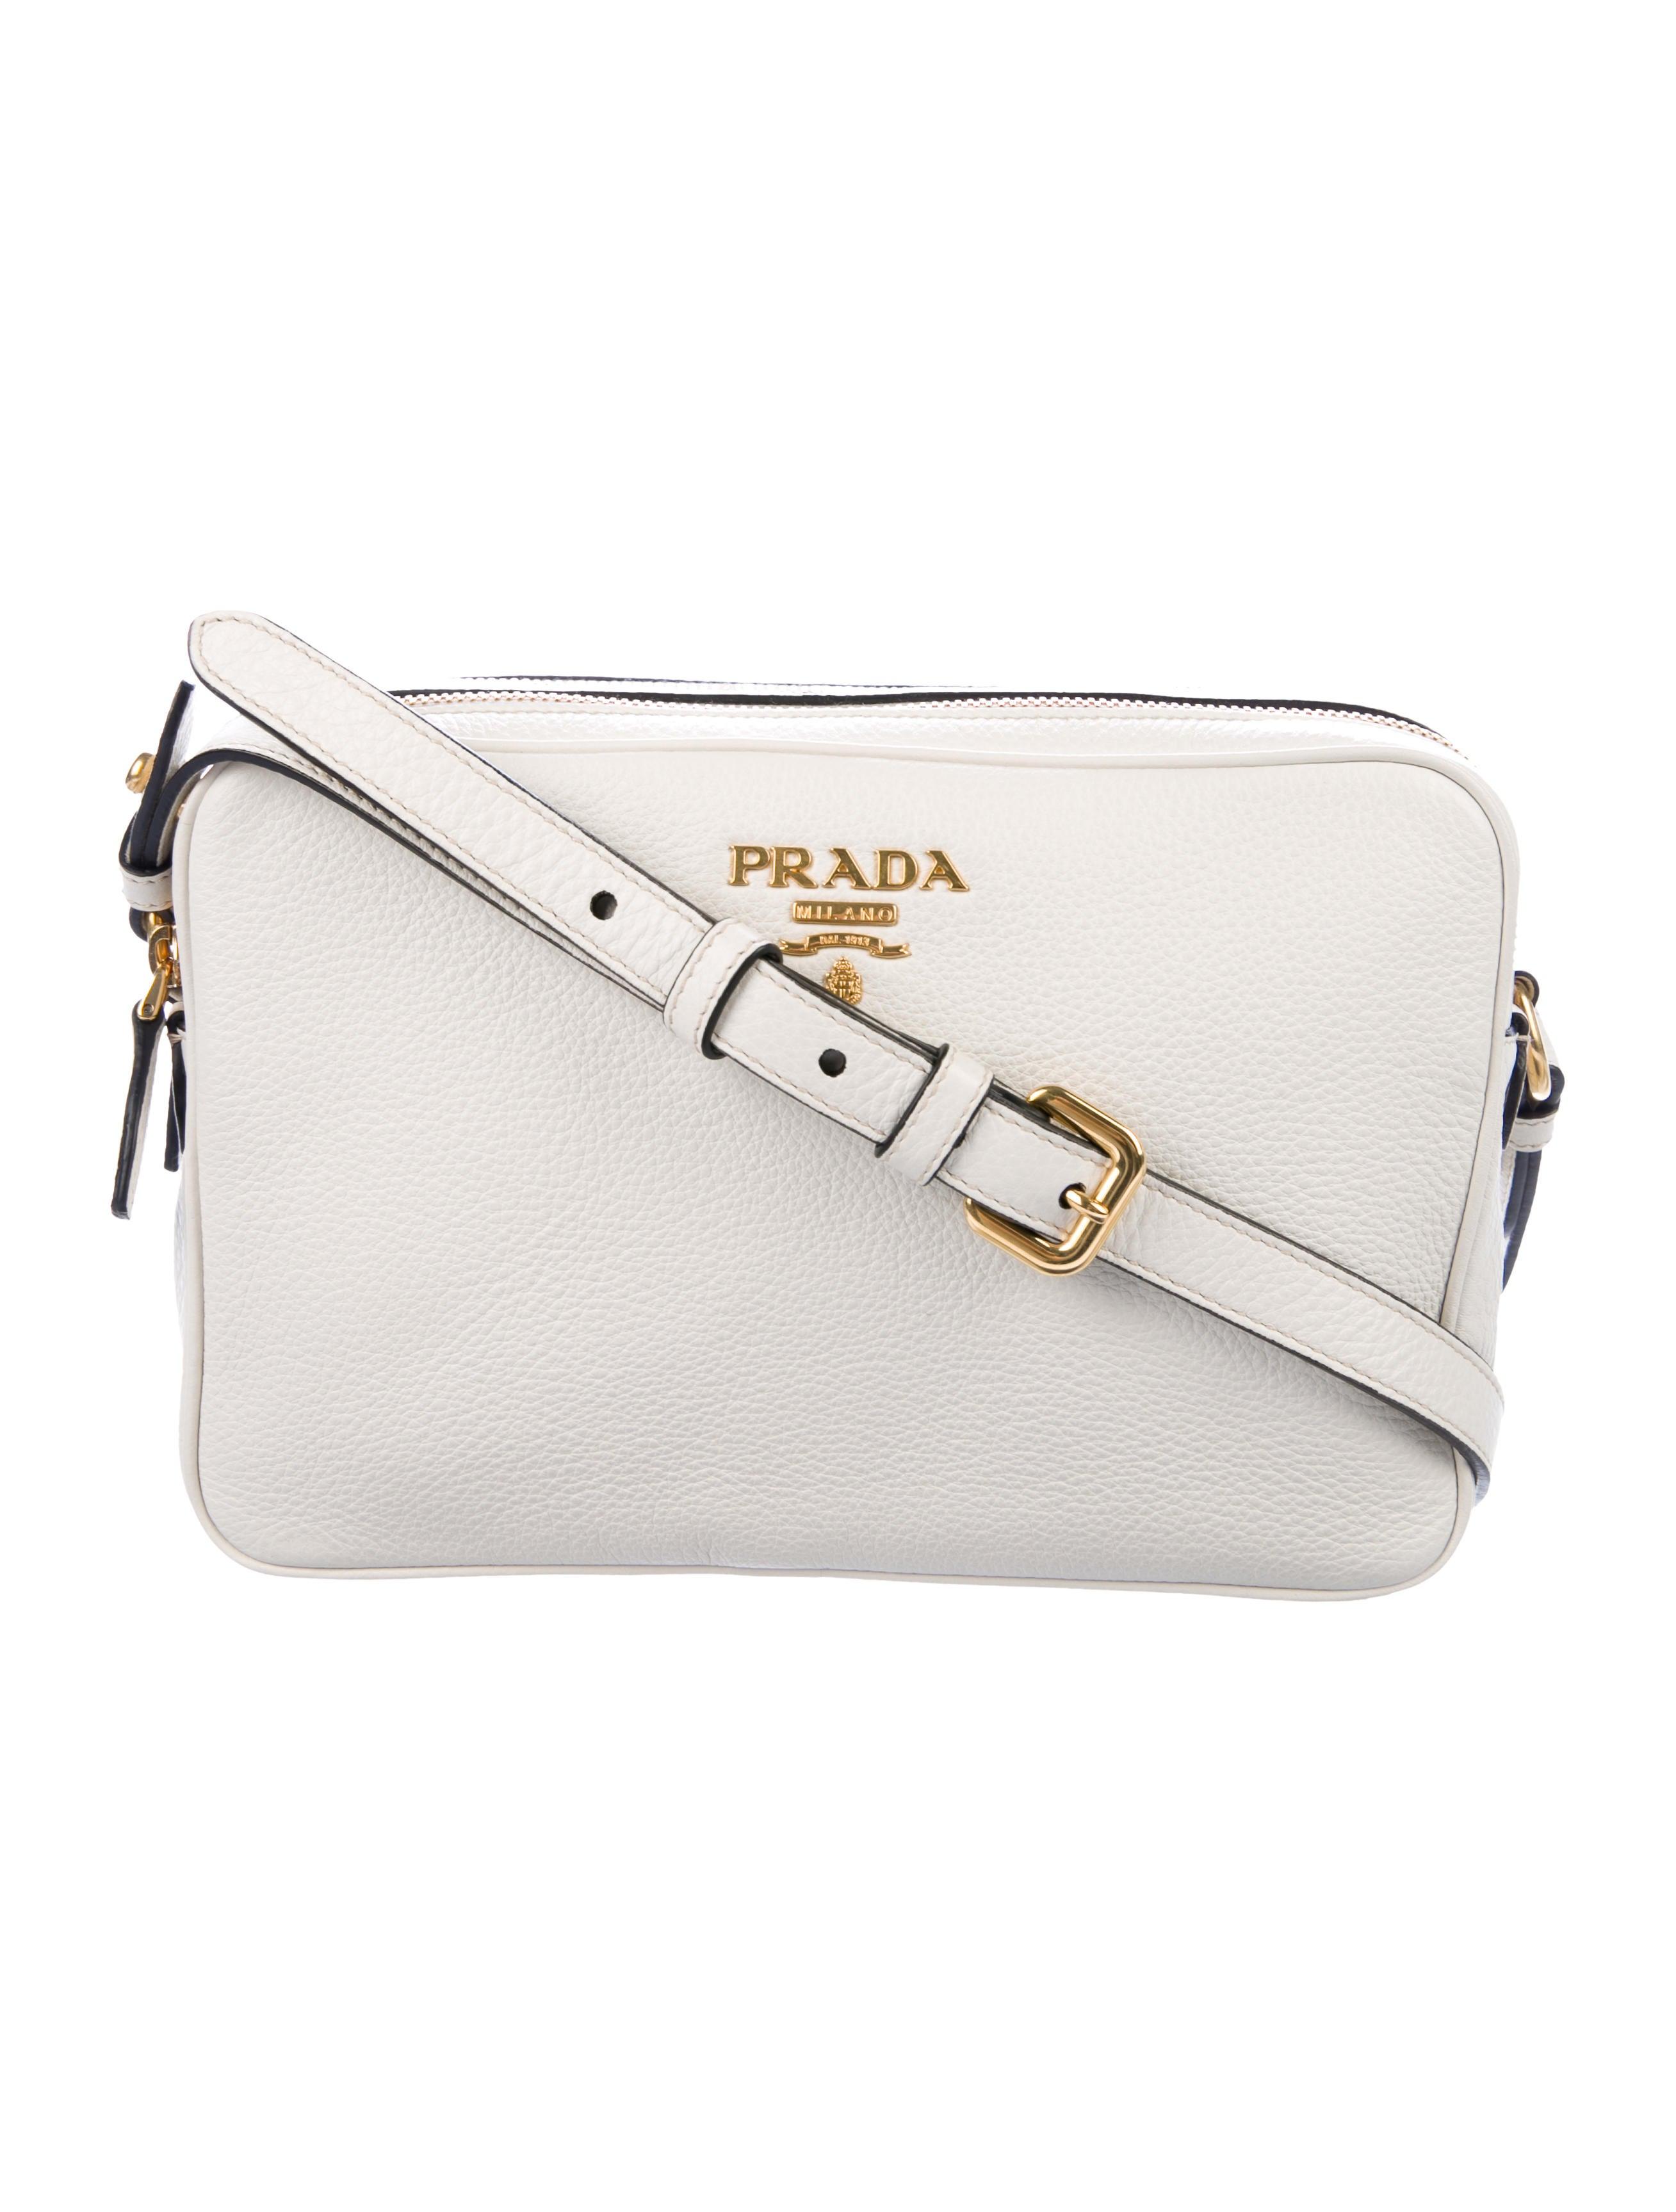 c9a5572b1617 Prada Vitello Phenix Double Zip Camera Bag - Handbags - PRA261678 ...